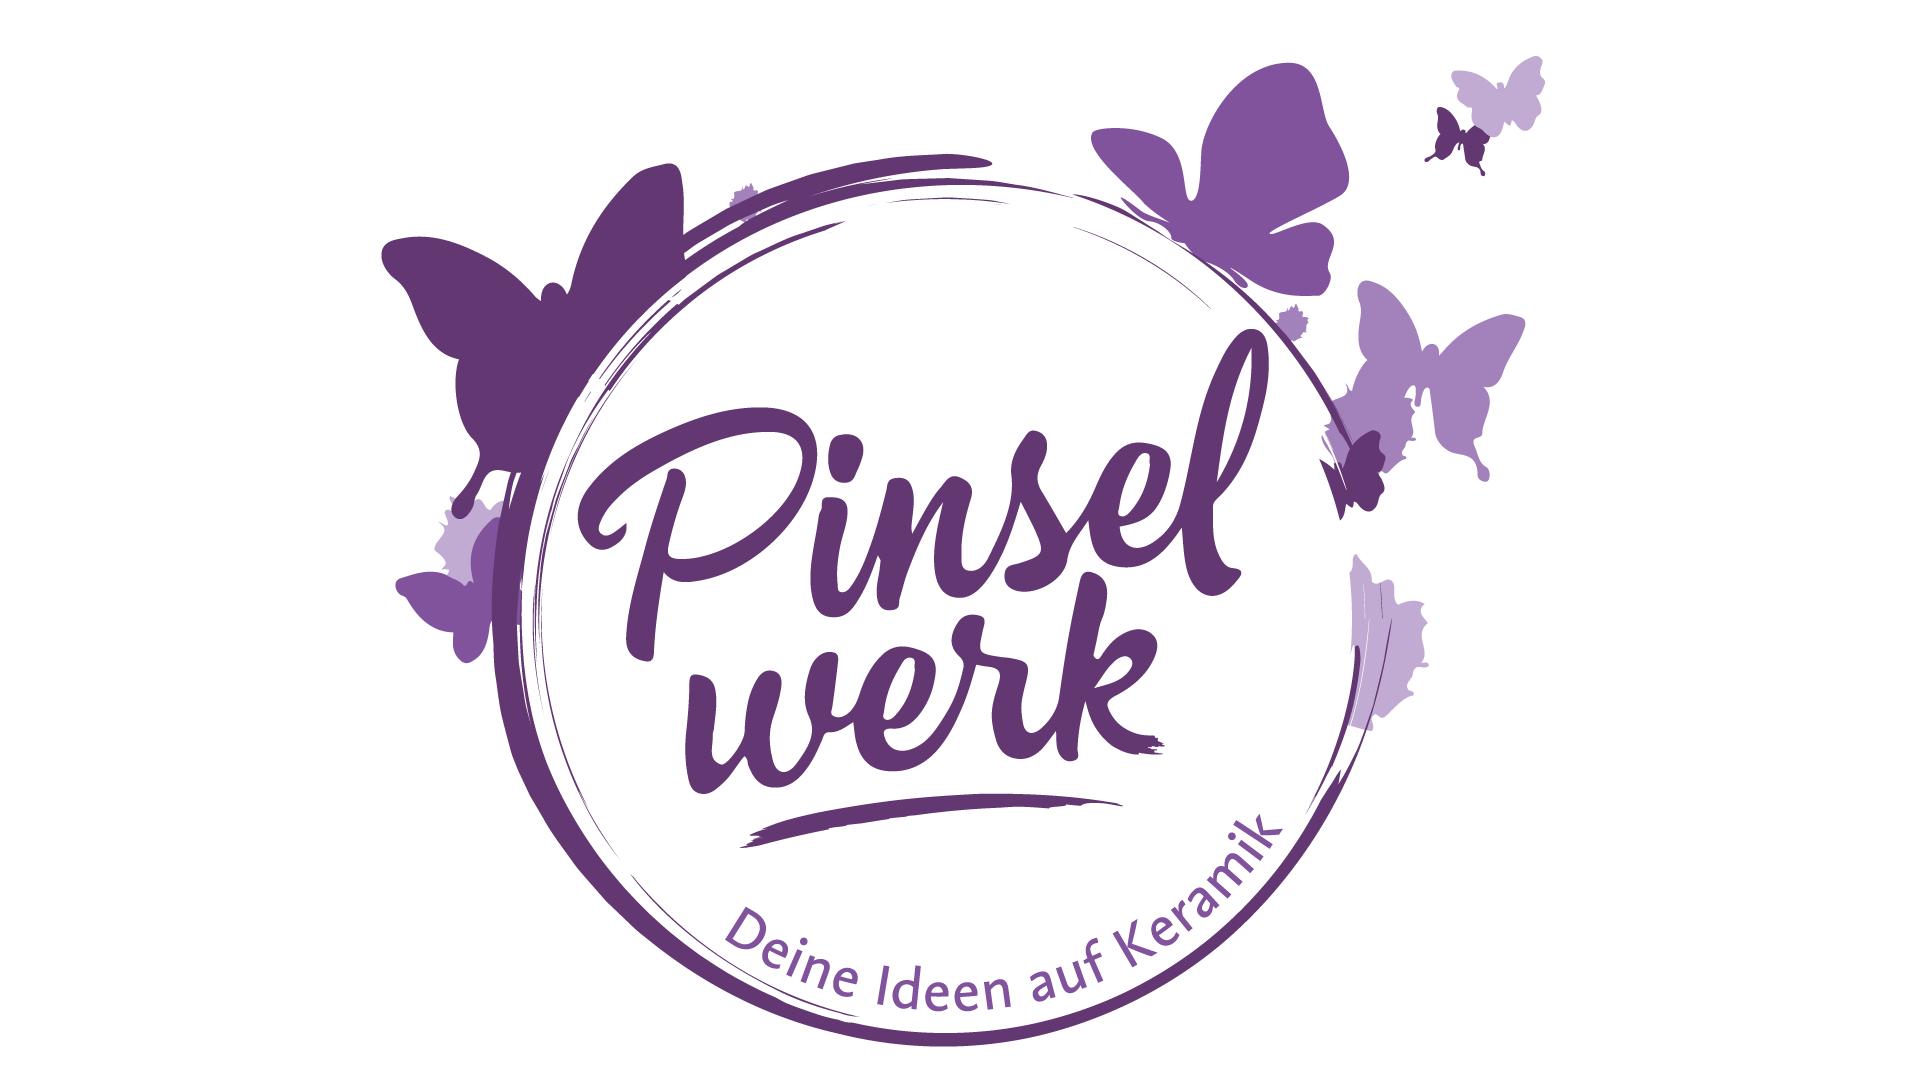 pinselwerk_1920x1080